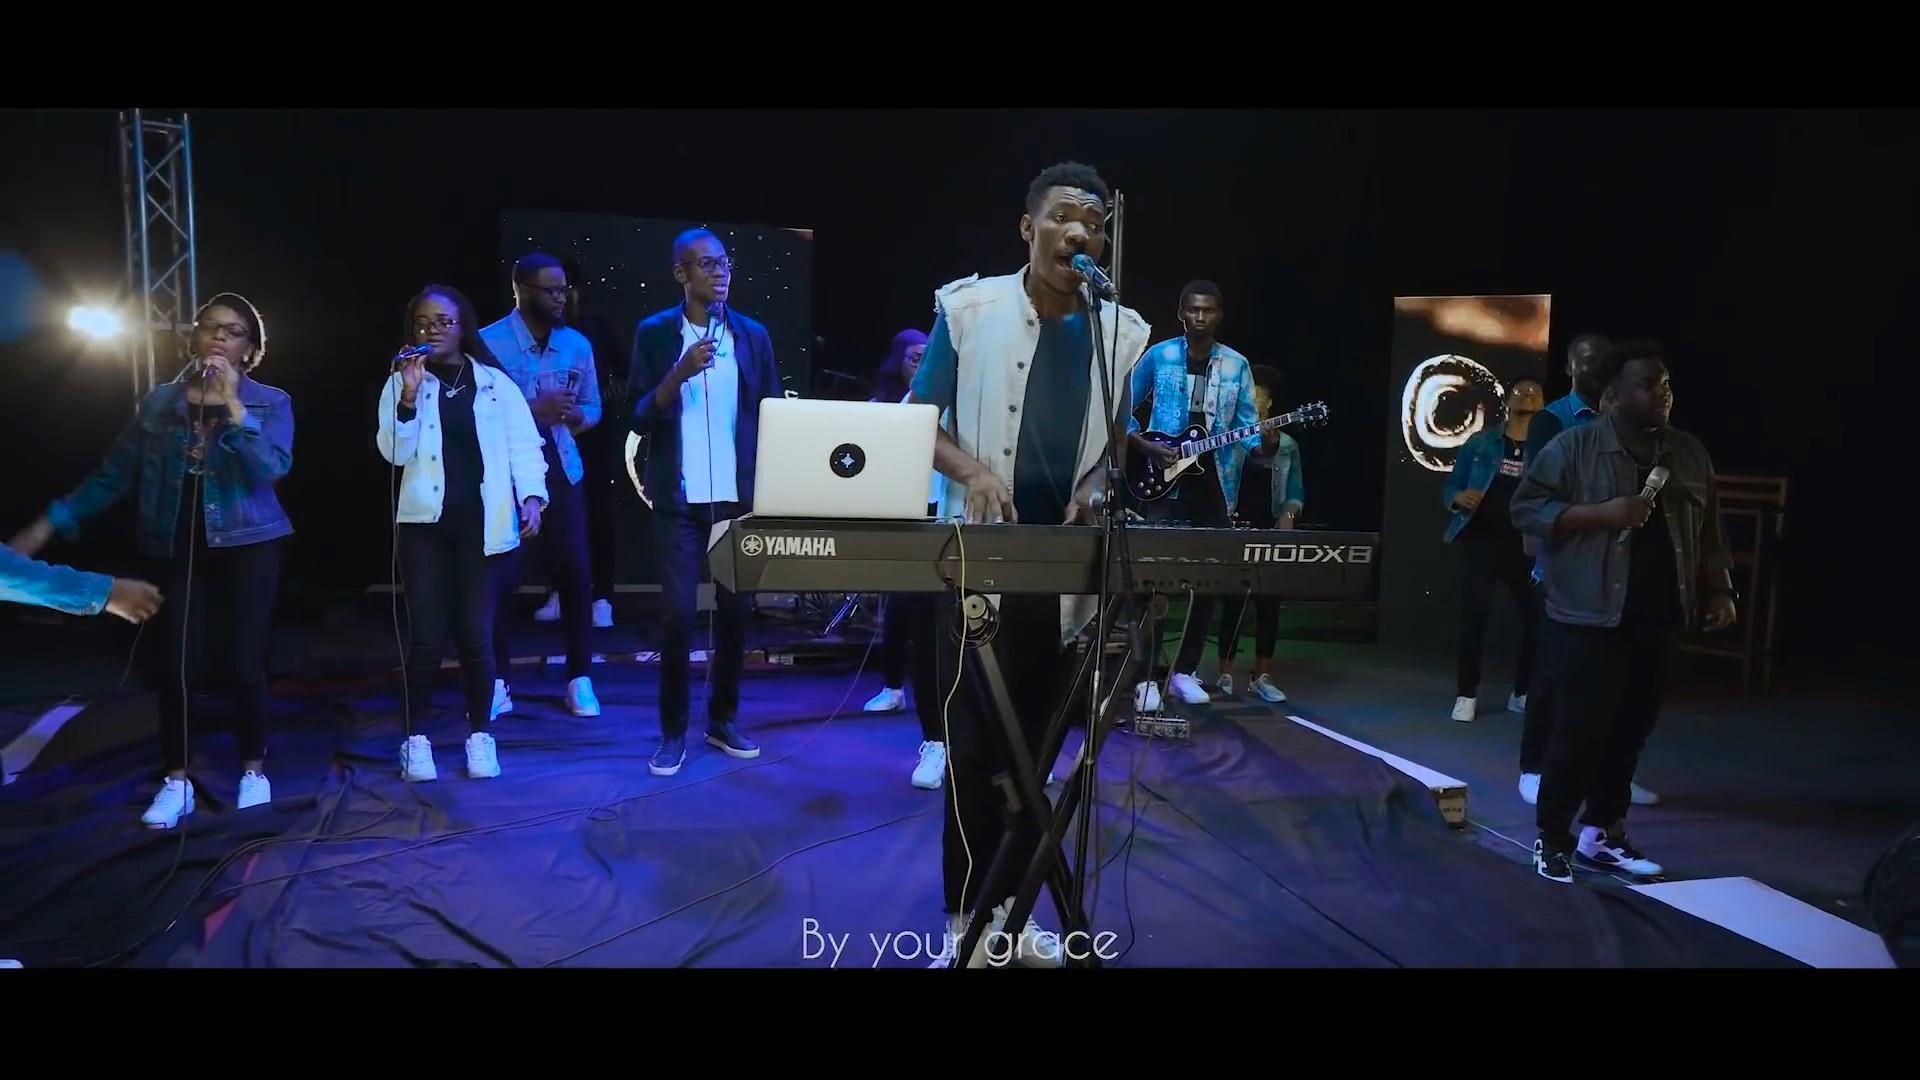 Jowell bombay feat hope kinshasa jesus est seigneur live 2020 mp4 snapshot 16 03 671